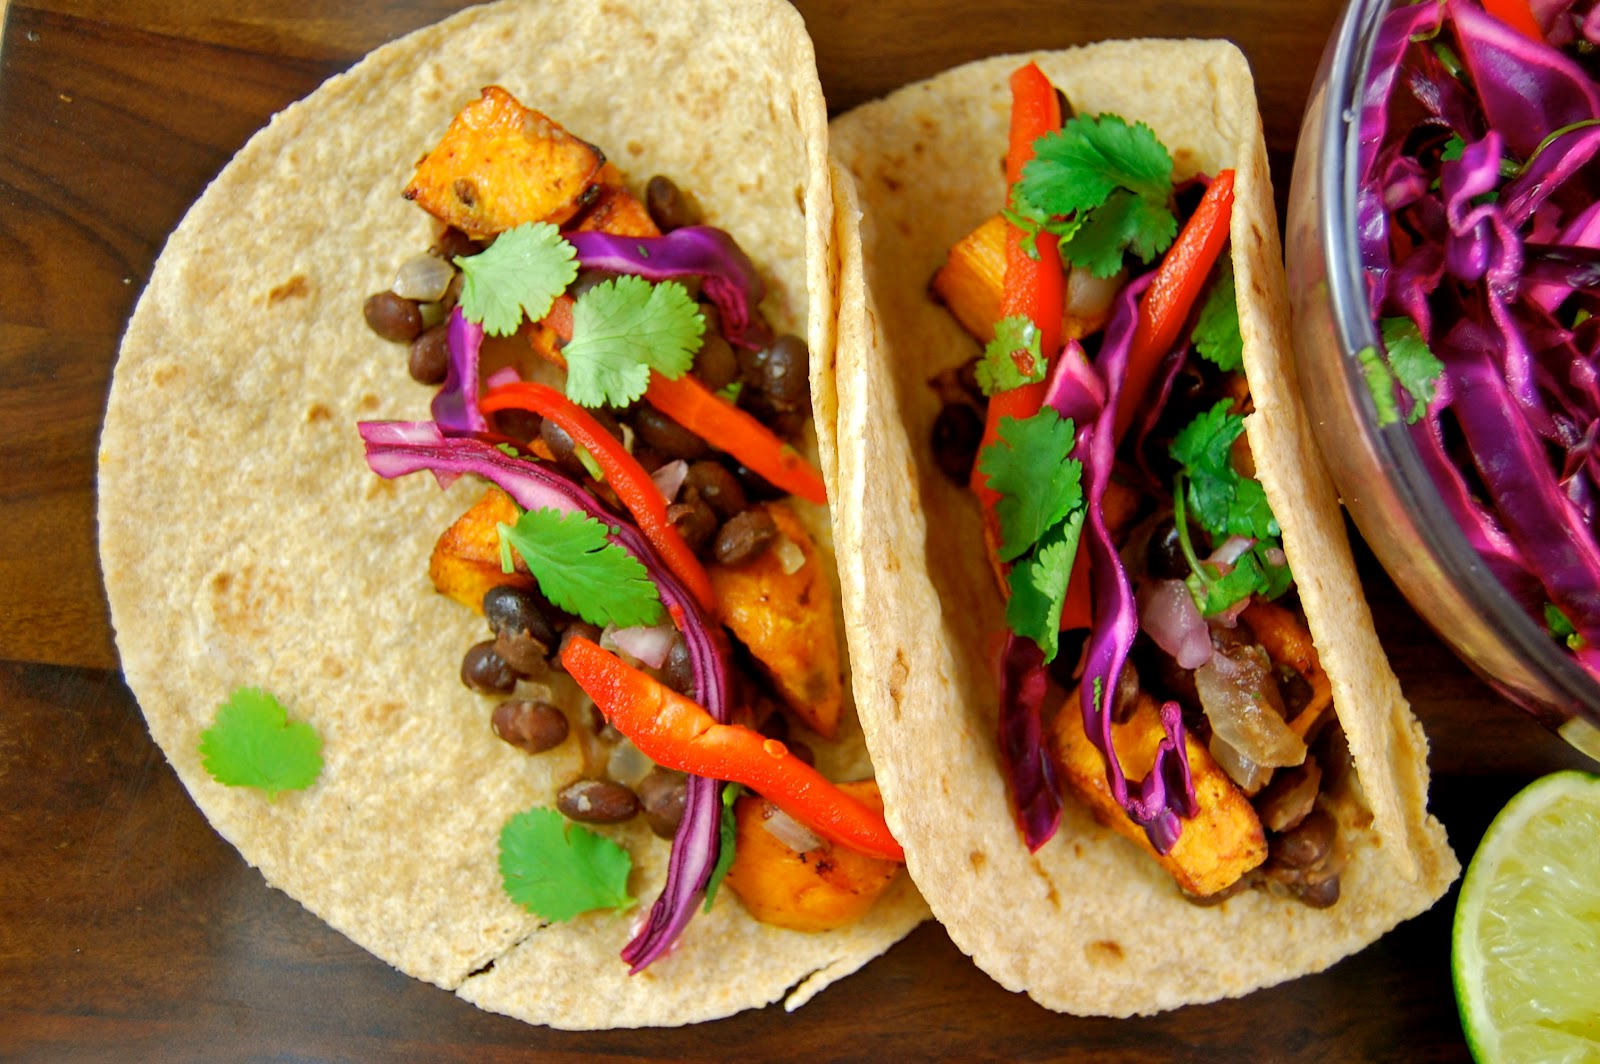 La Petite Maison Verte: Chipotle-Glazed Sweet Potato Tacos ...